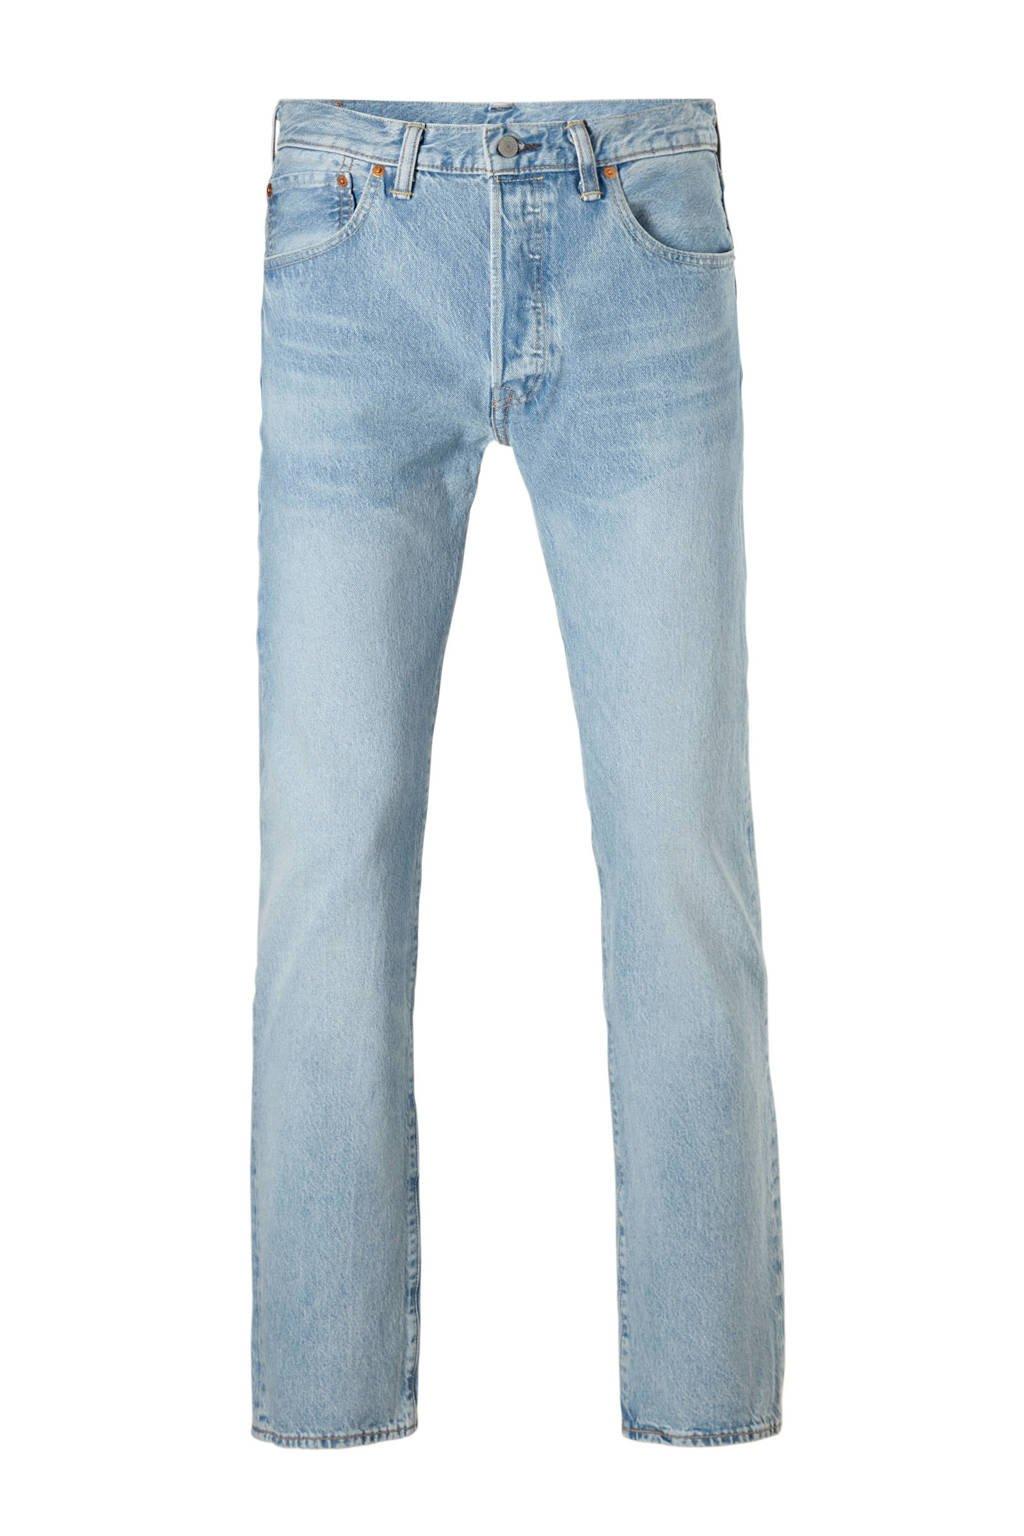 Levi's 501 Original regular fit jeans, Mowhawk Warp Str